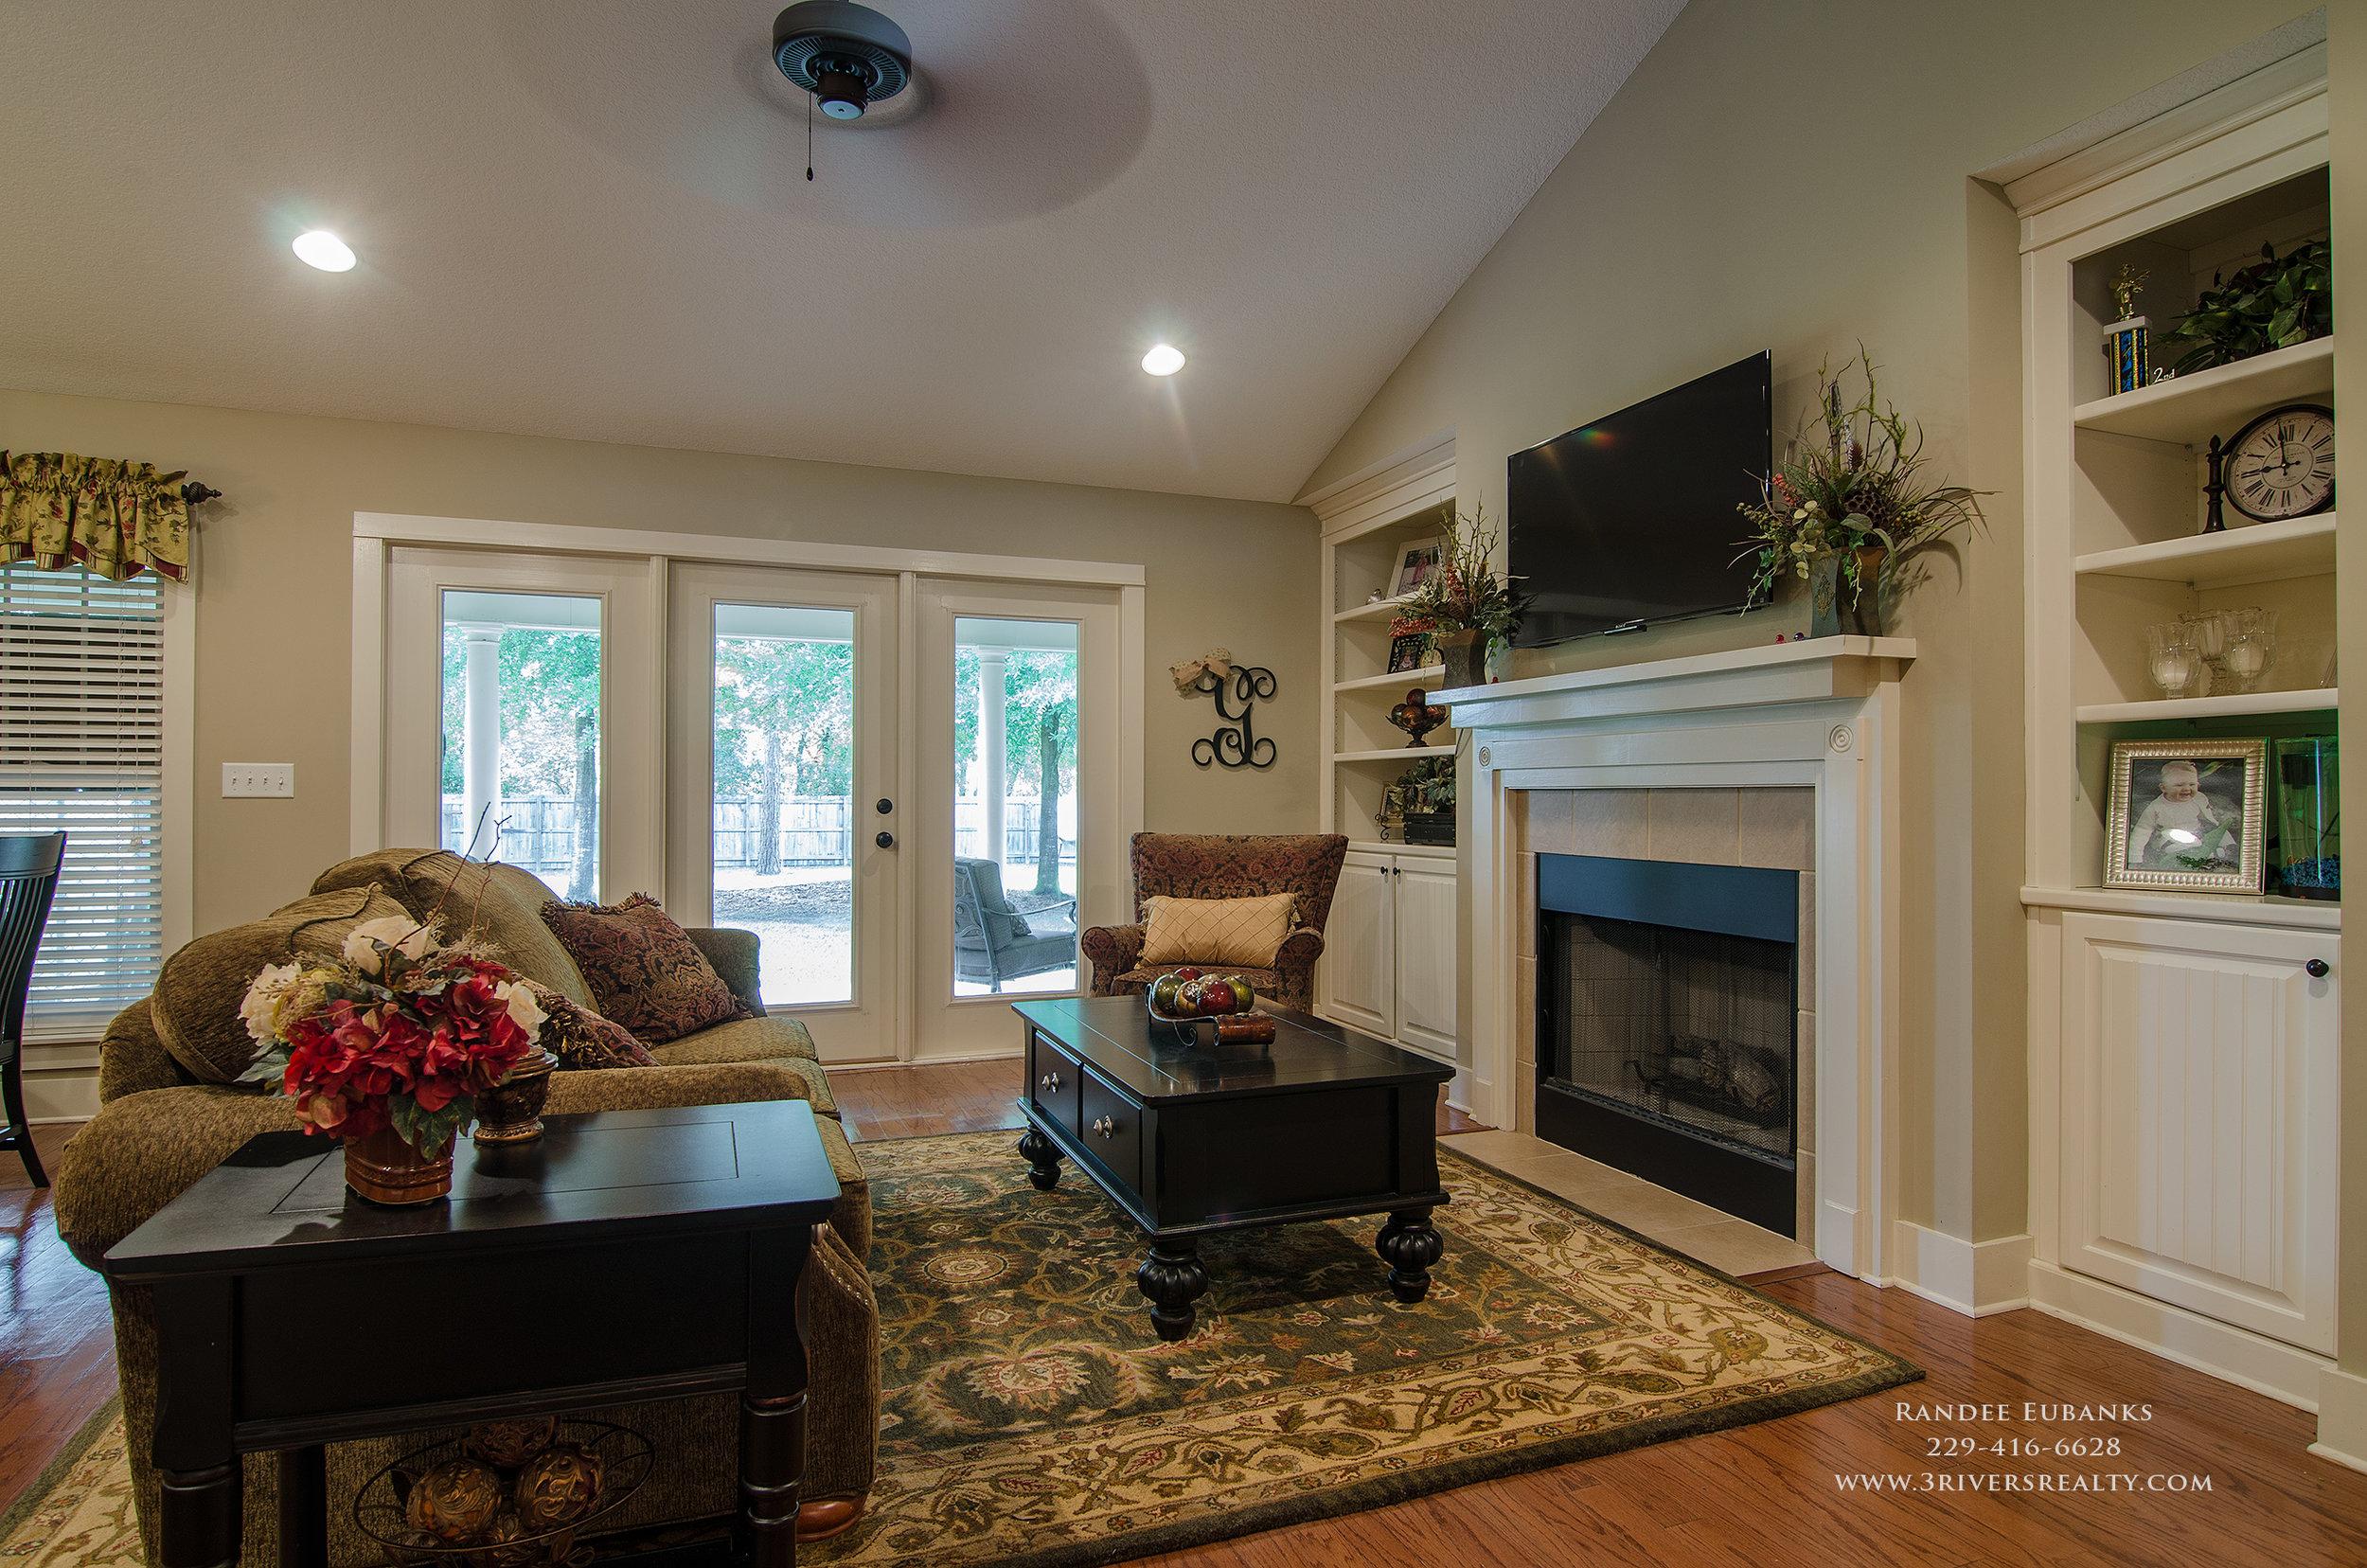 3riversrealty_bainbridge-georgia-home-for-sale_3-bed-2-bath_outdoor-fireplace_three-rivers-realty_mills-brock_TaurusUSA_pool_back-porch-fireplacae_livingroom - Copy.jpg